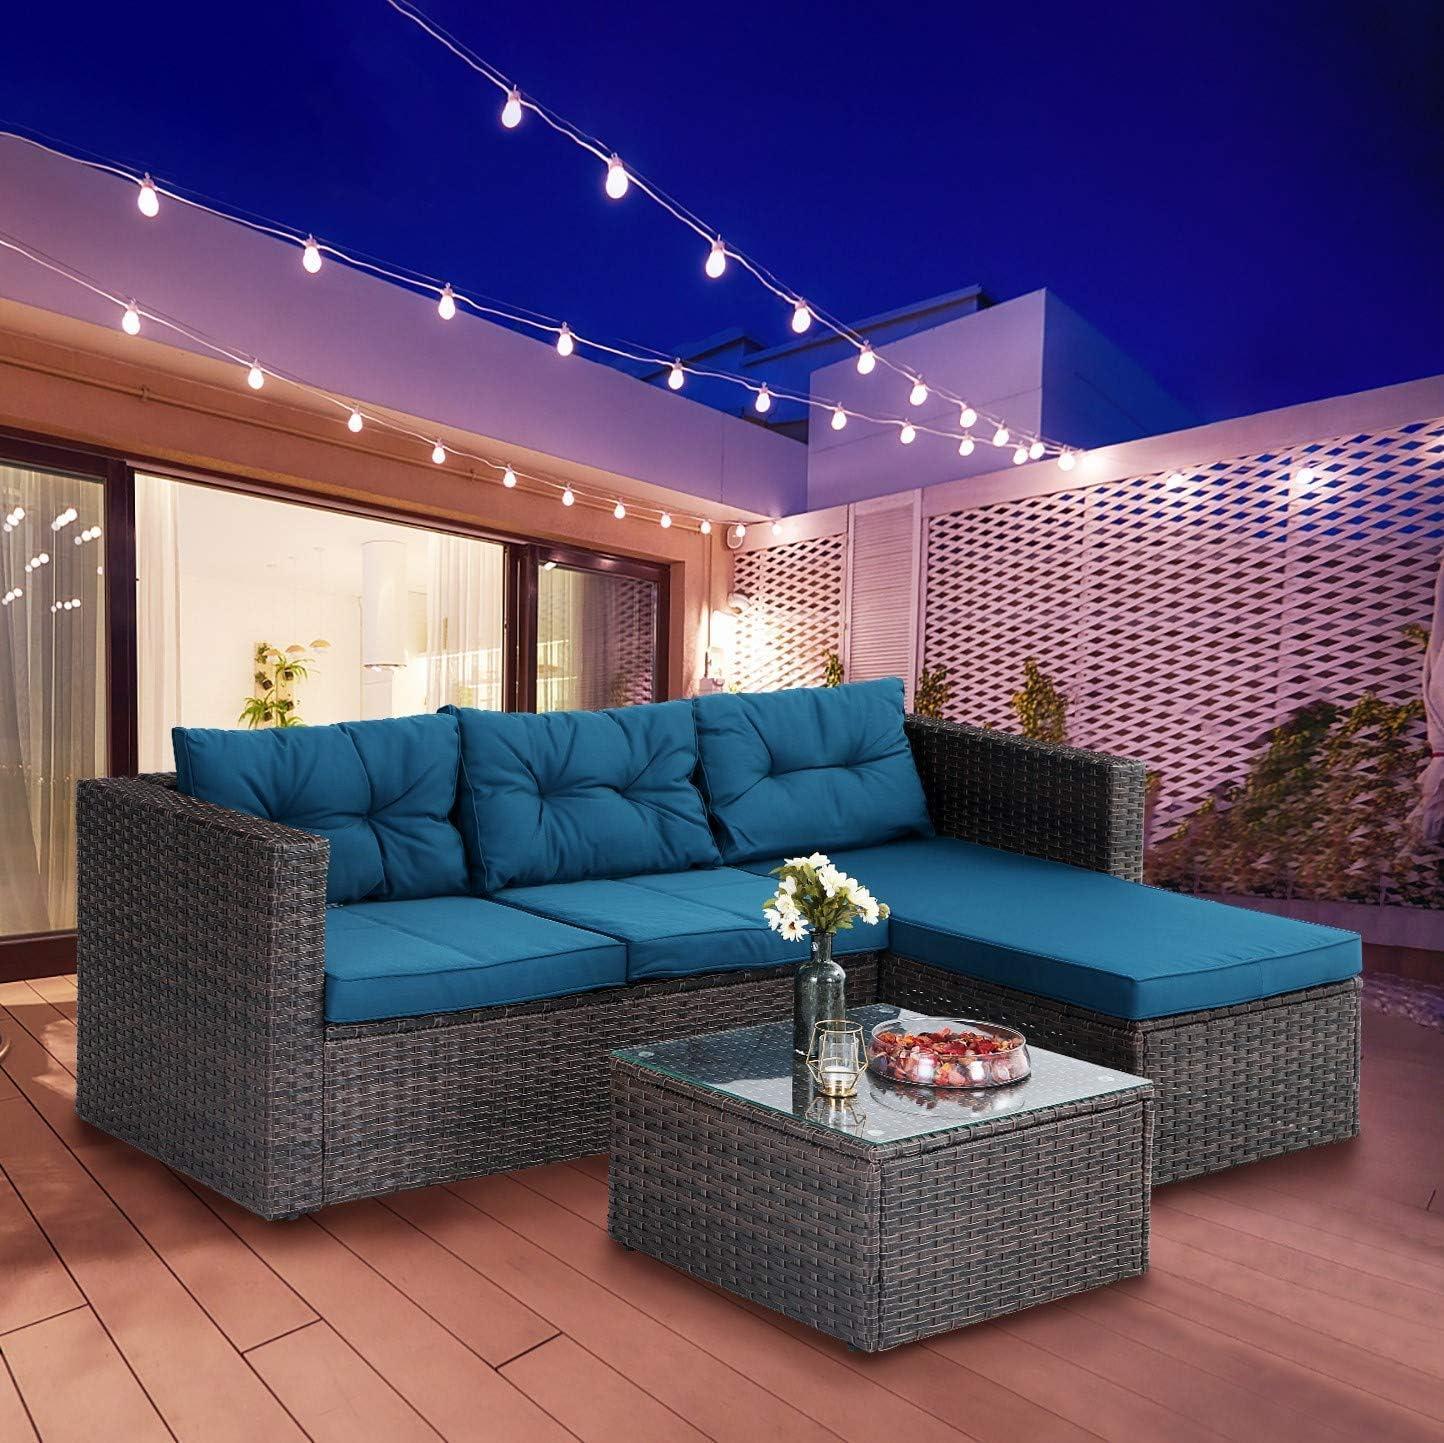 PHI VILLA Outdoor Sectional Rattan Sofa - Wicker Patio Furniture Set (Turquoise)